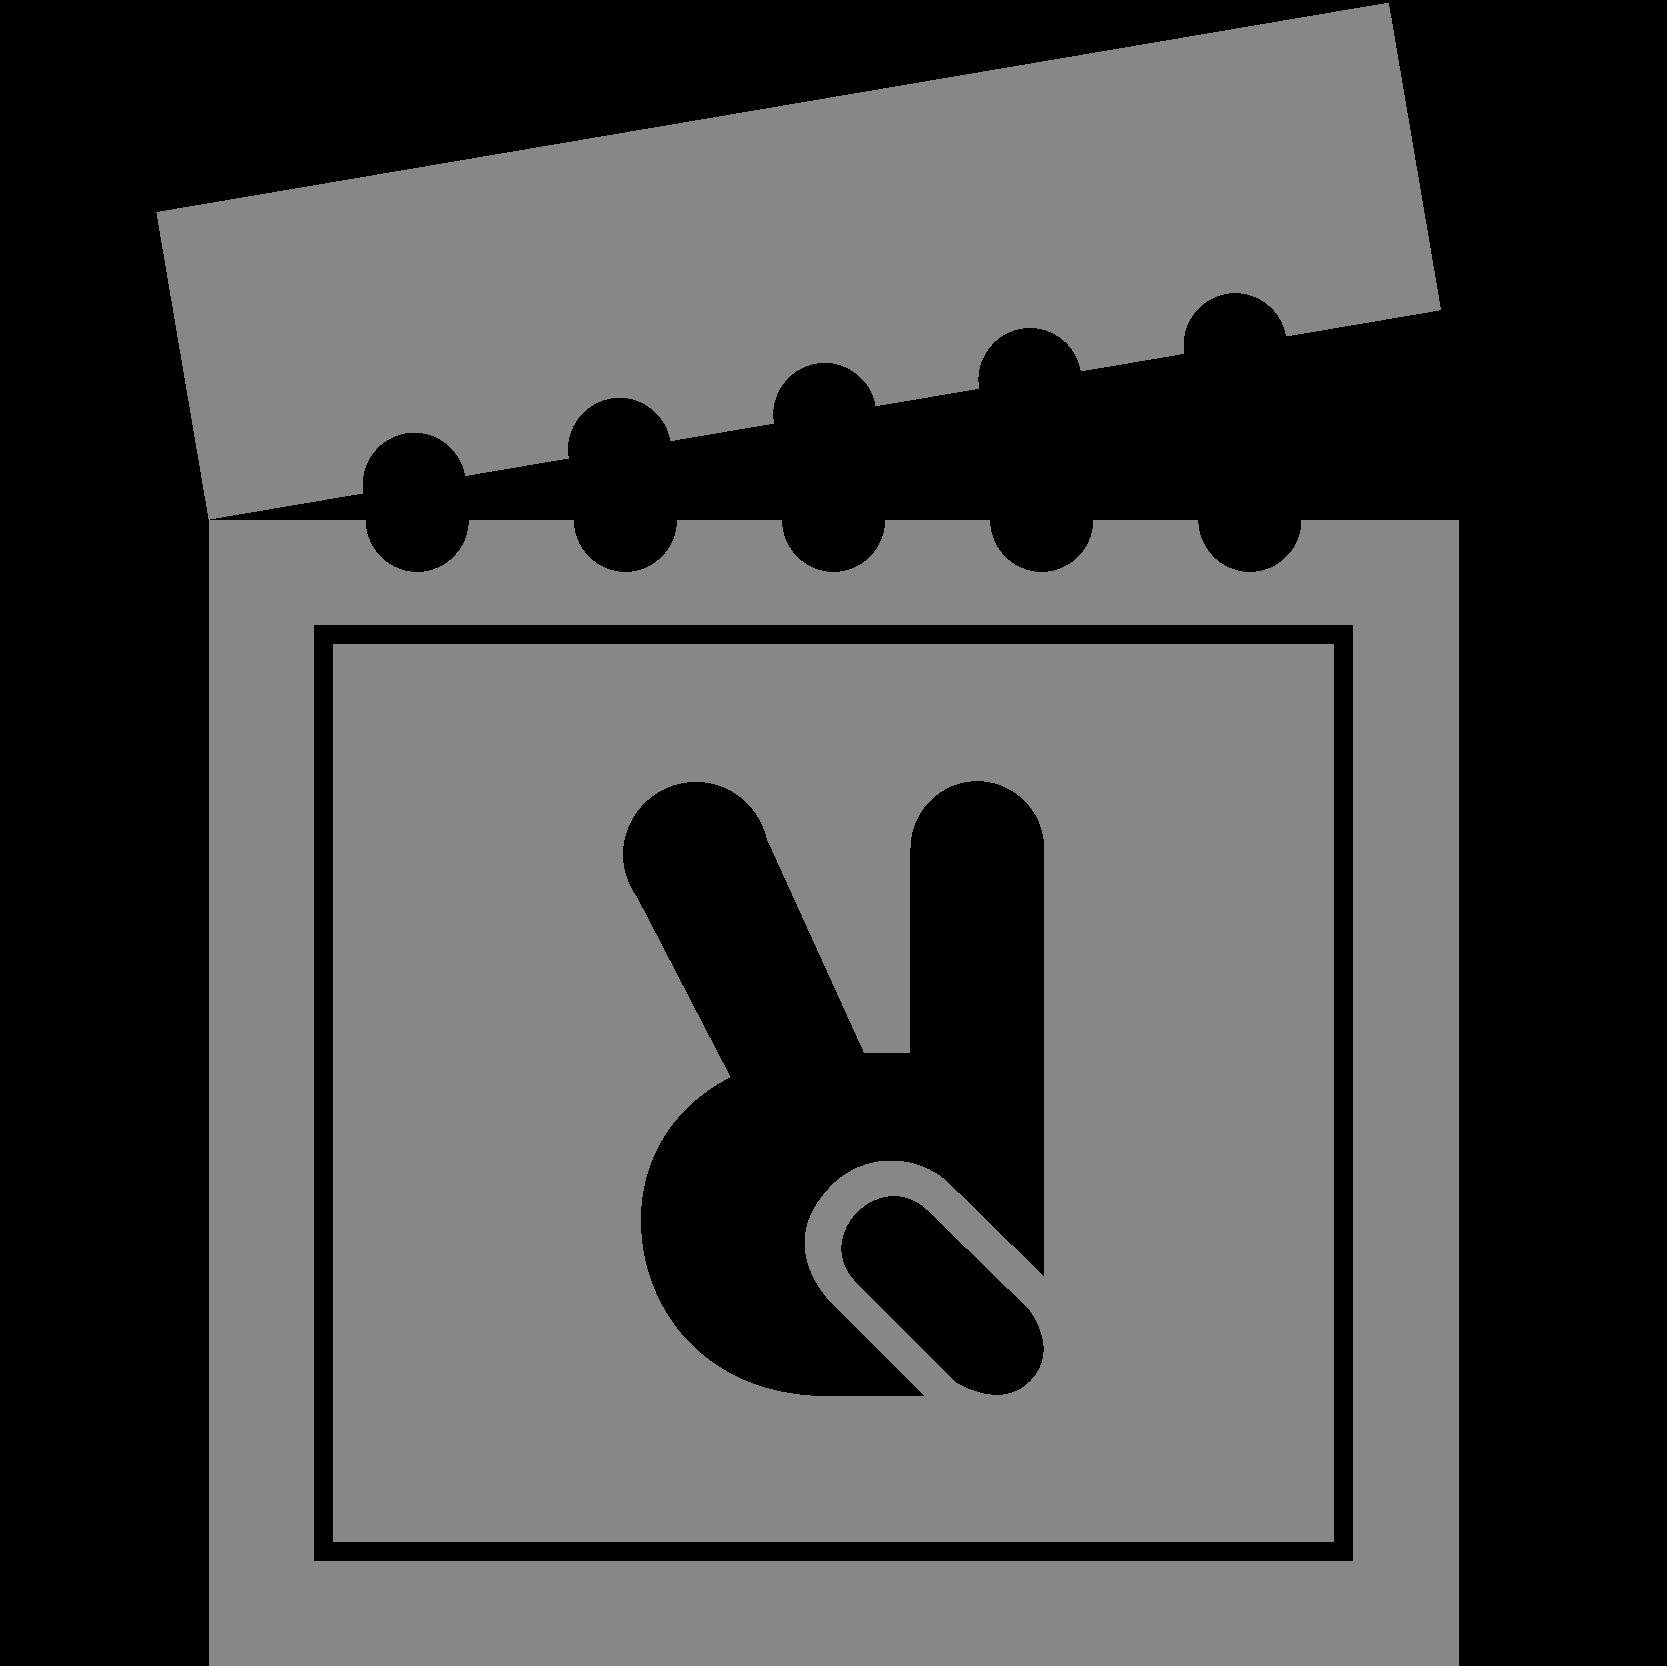 Etiqueta Removible